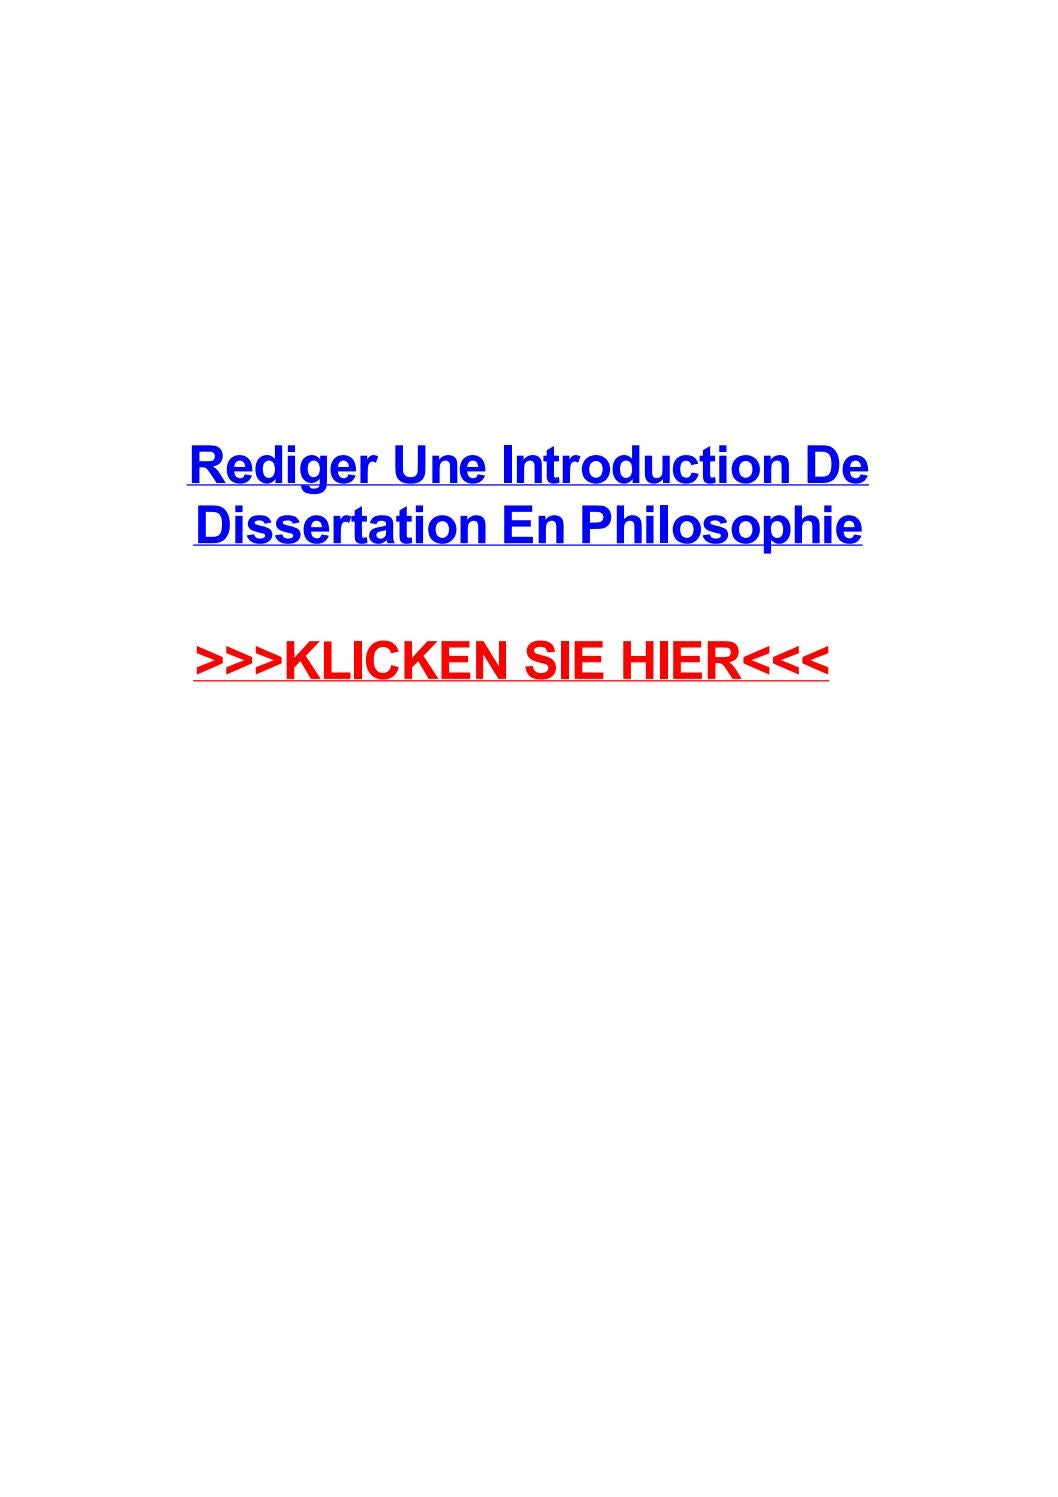 Online university homework help